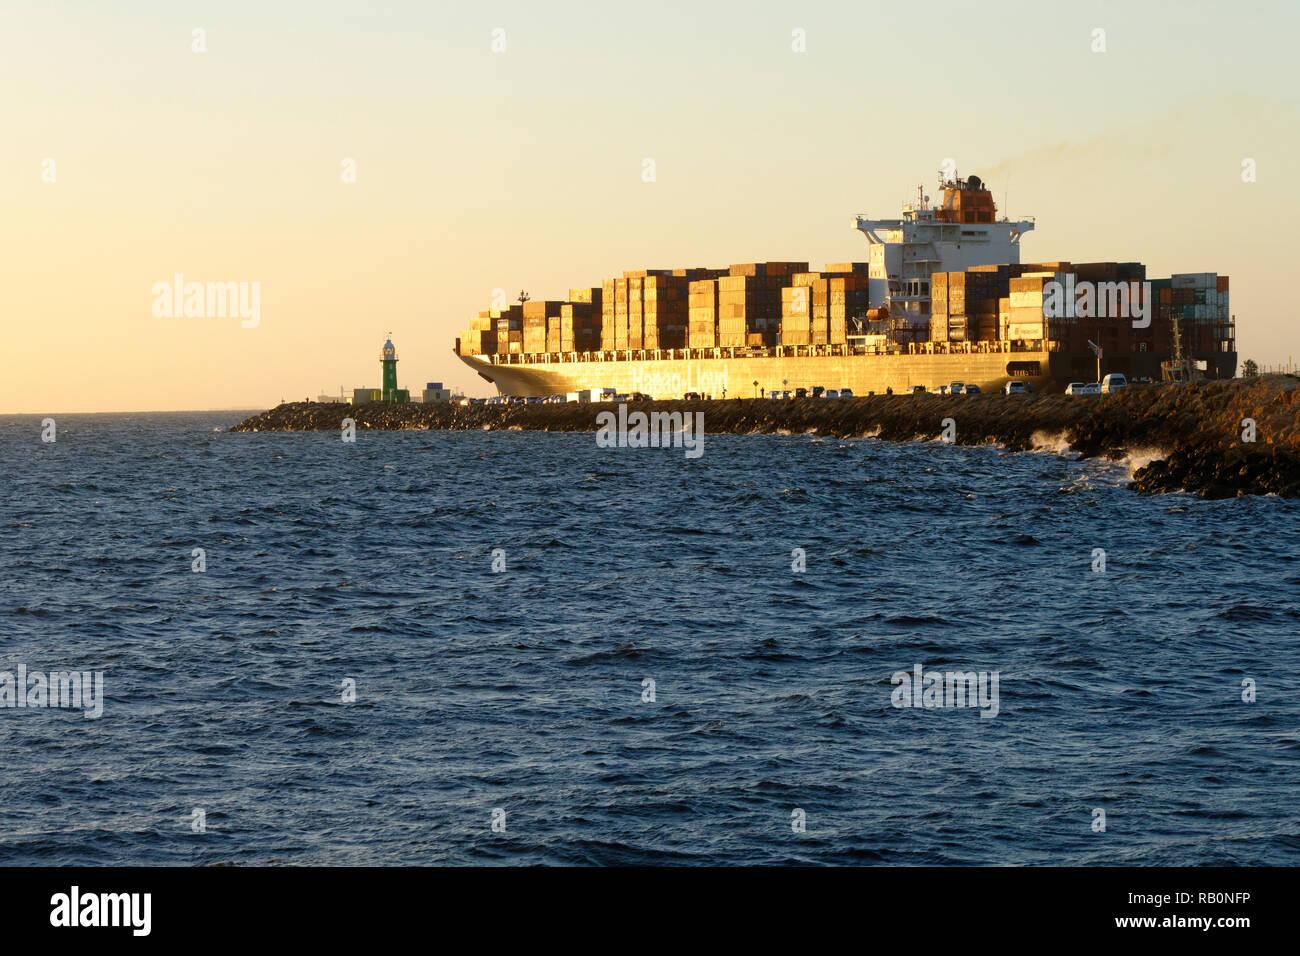 Container ship Al Hilal Monrovia  passing south mole as it leaves Fremantle harbour, Fremantle, Western Australia - Stock Image